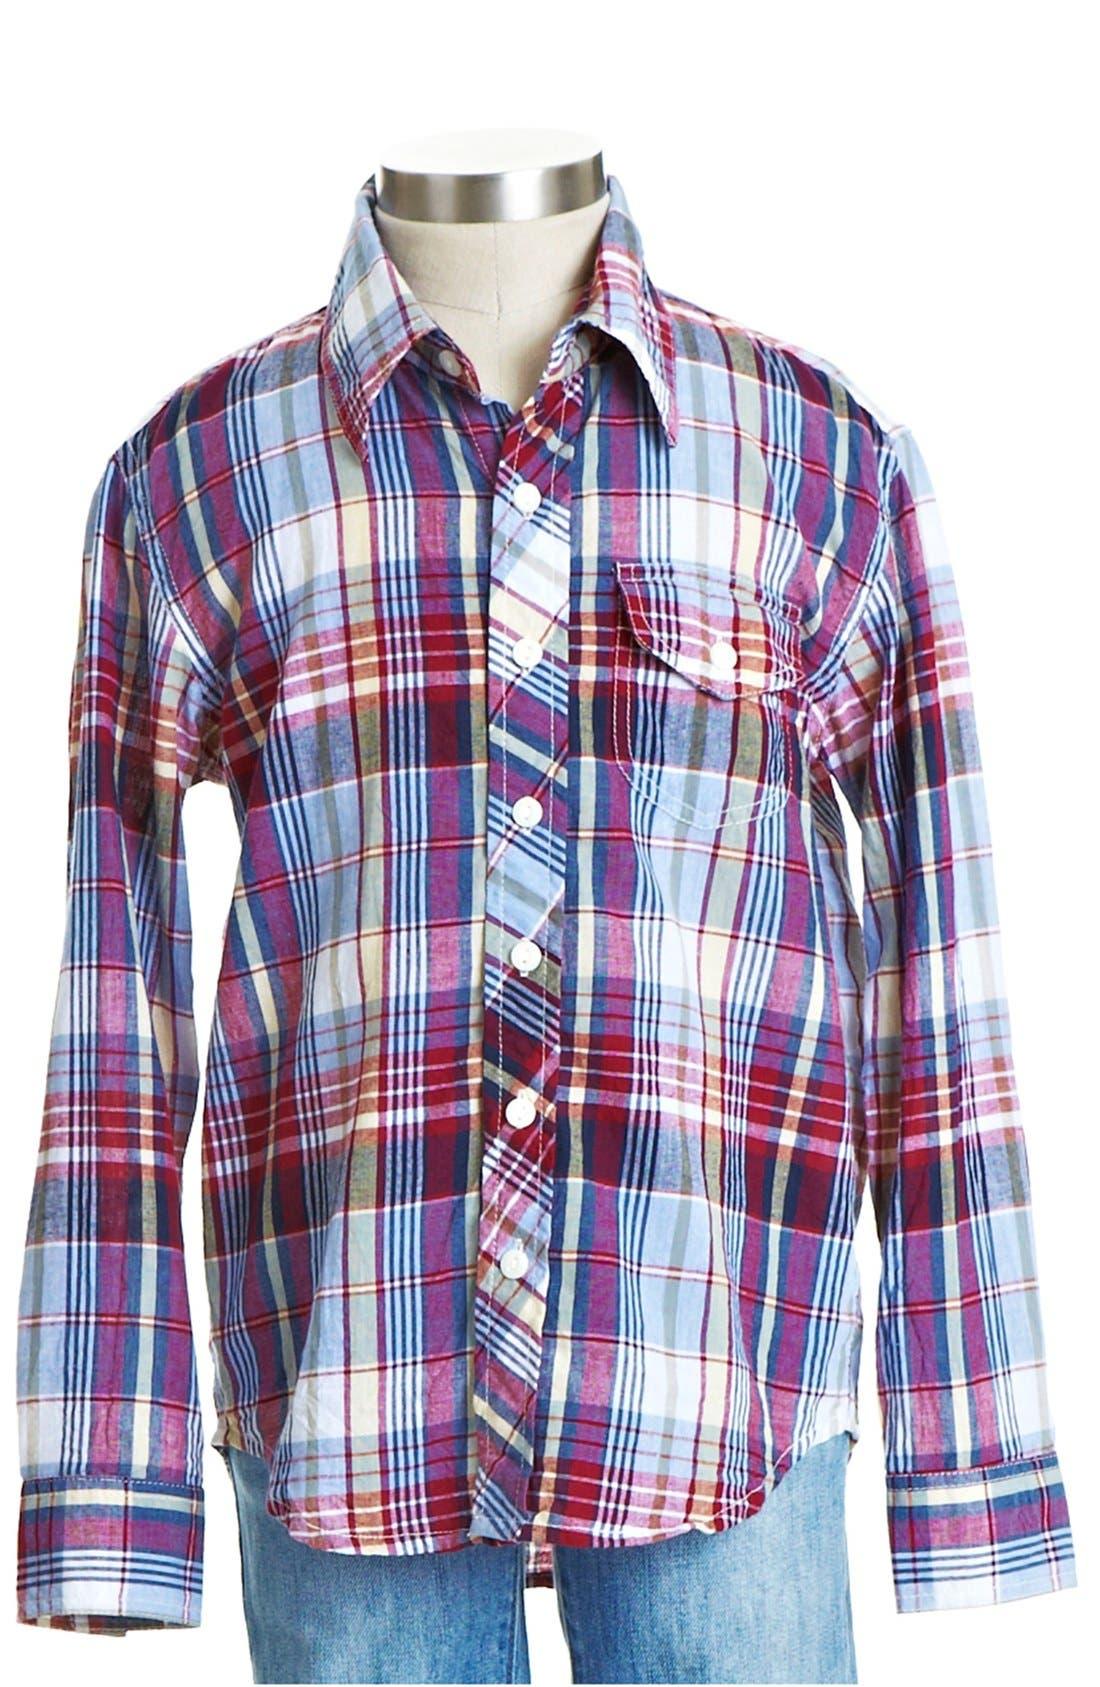 Main Image - Peek 'Brunswick' Plaid Shirt (Toddler Boys, Little Boys & Big Boys)